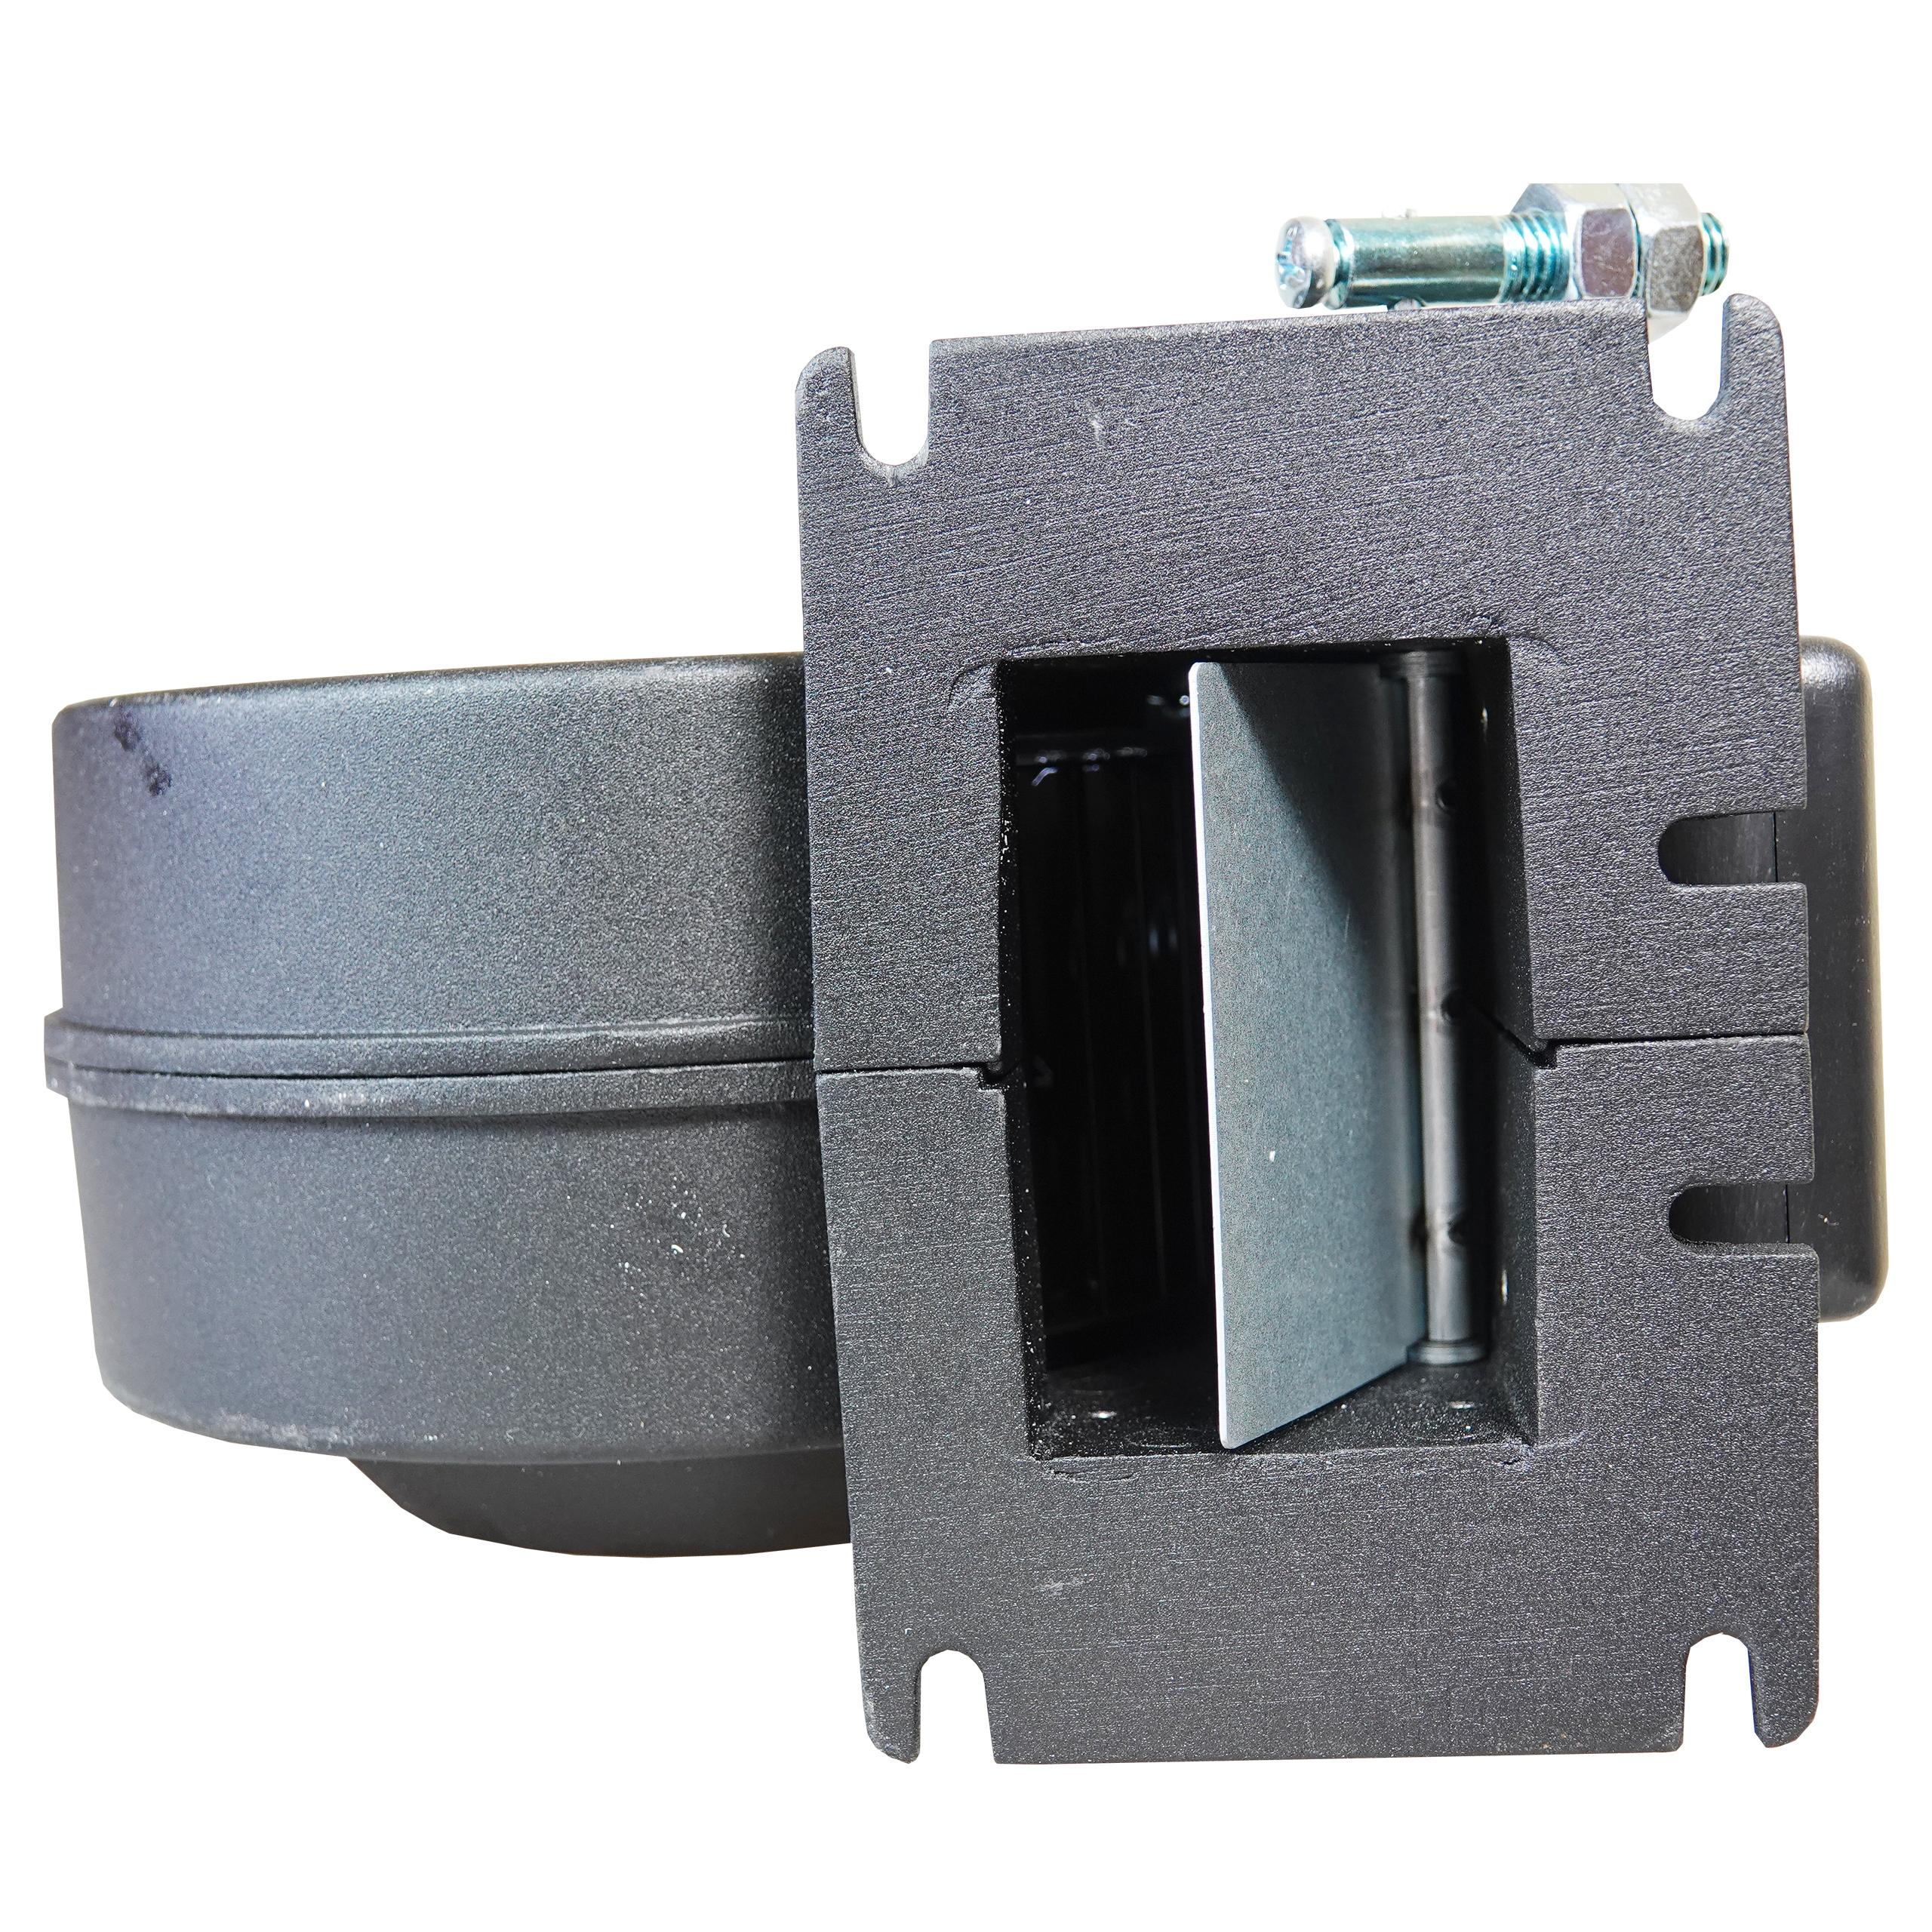 Dúchadlo WPA x2 ventilátor kotlovej pece WPA 120 67W Kód produktu 12290